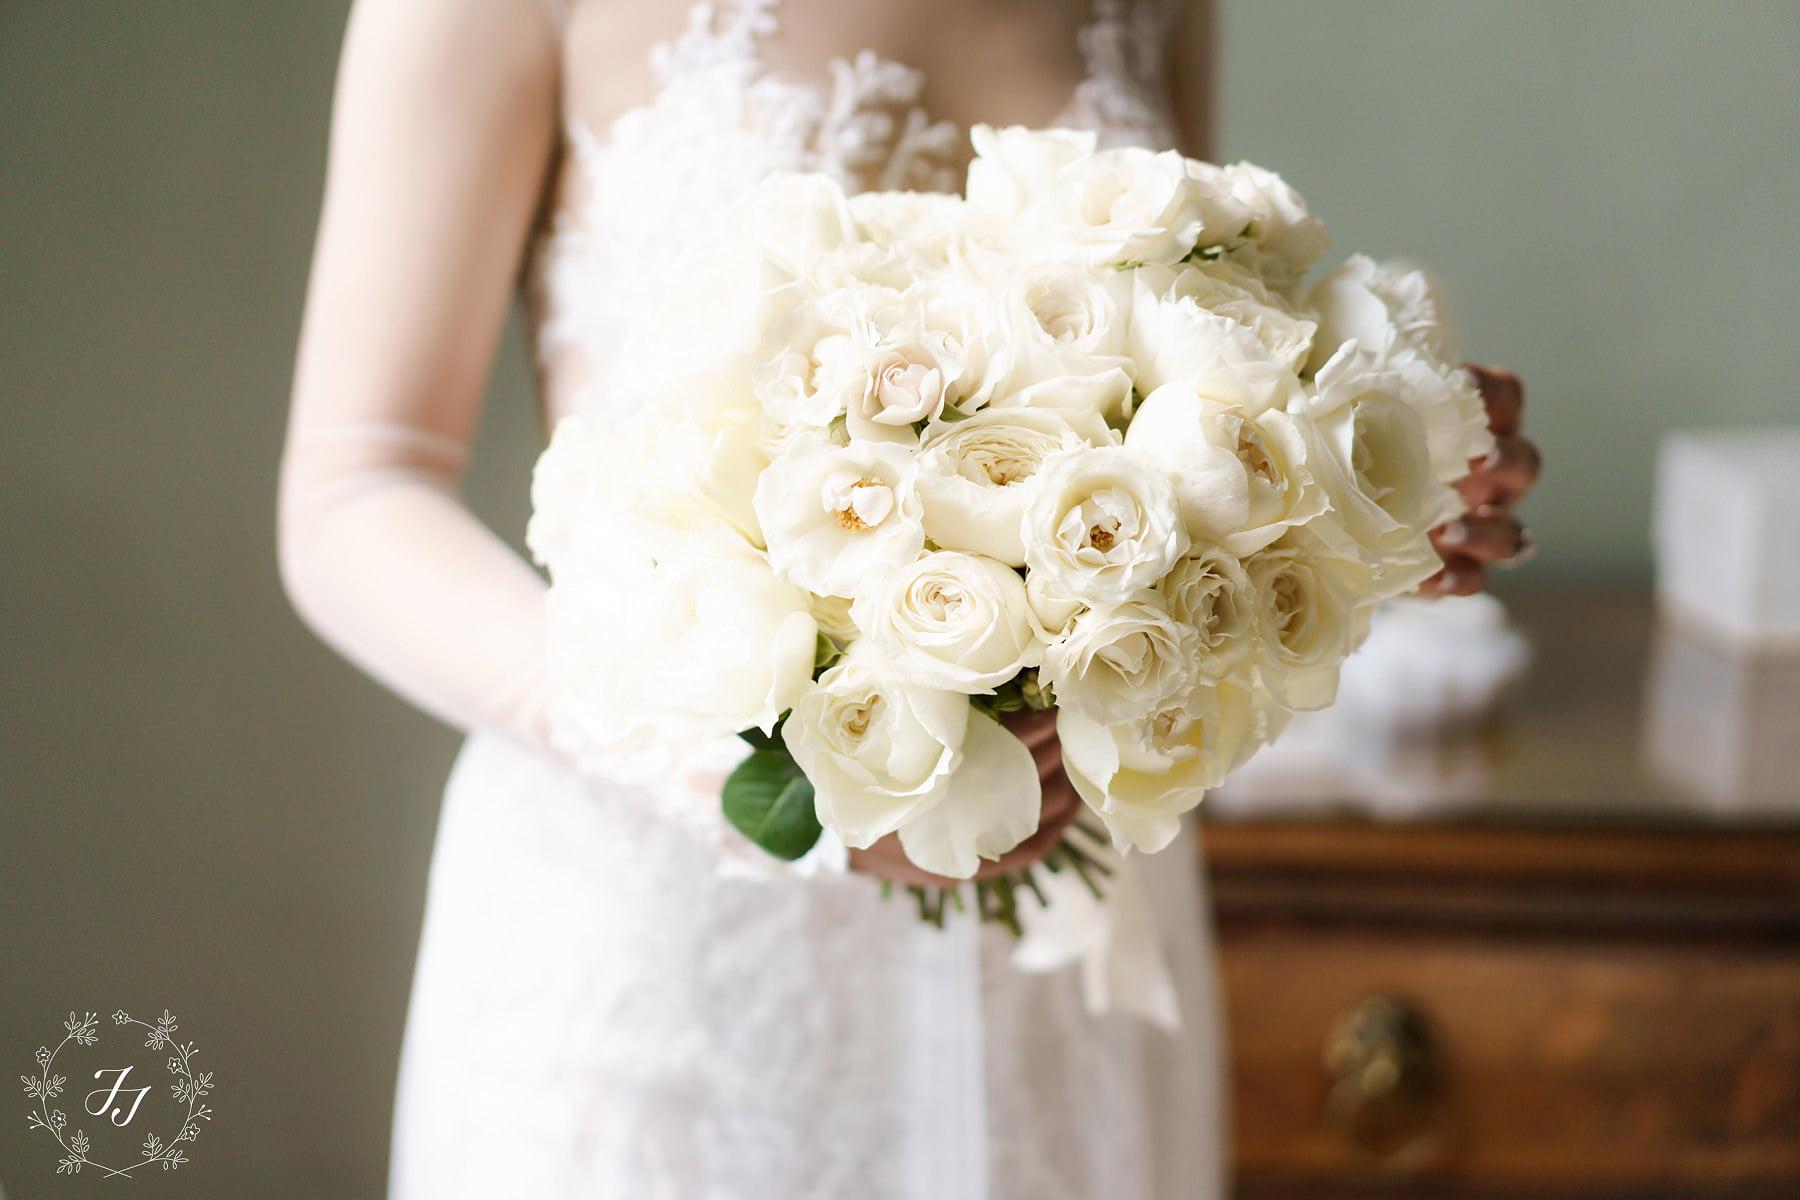 Zeenat holding her white modern rose bouquet